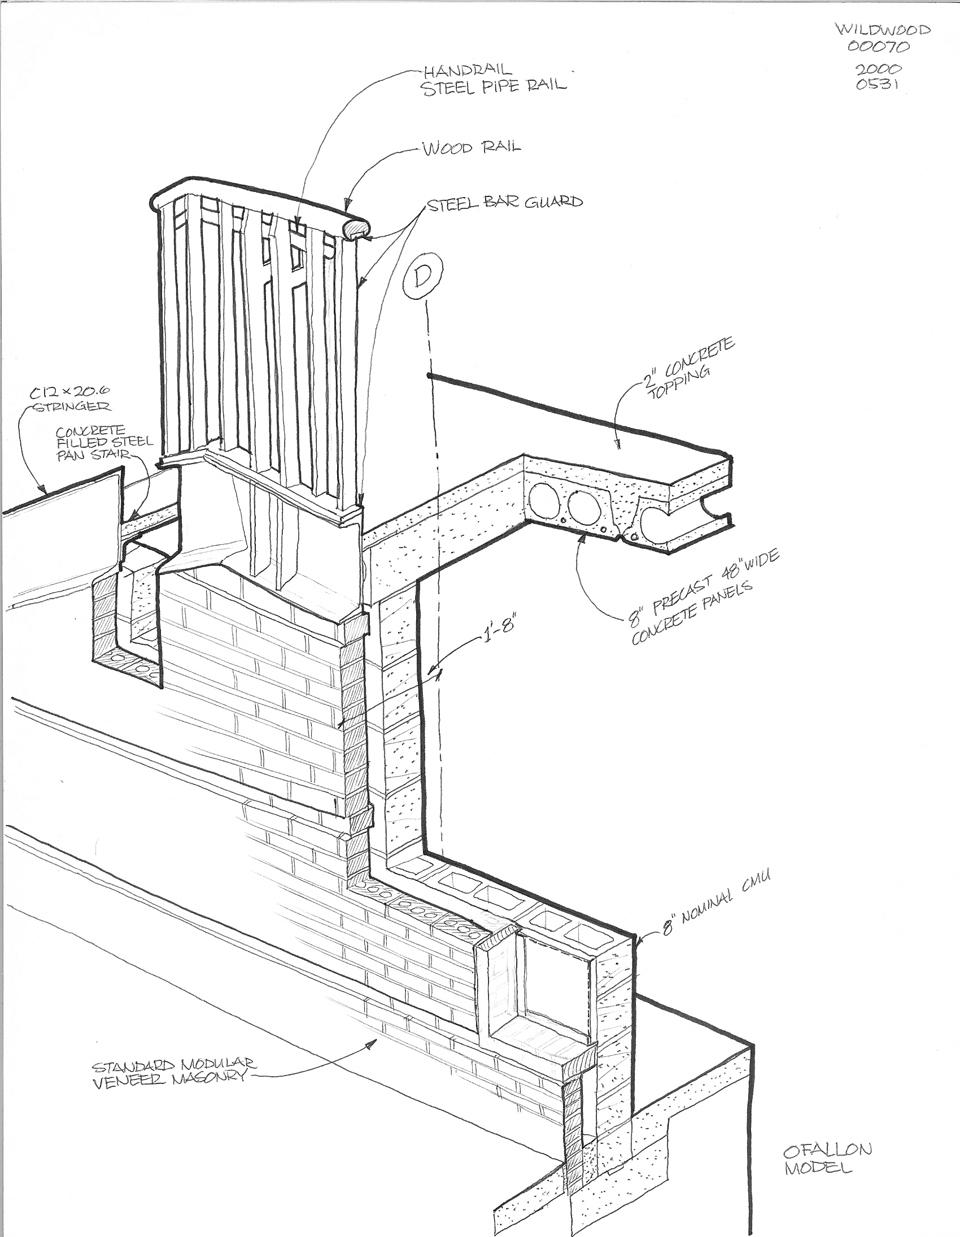 960x1237 Hollow Core Plank Rail Study 1 Constructability Study K63a7d